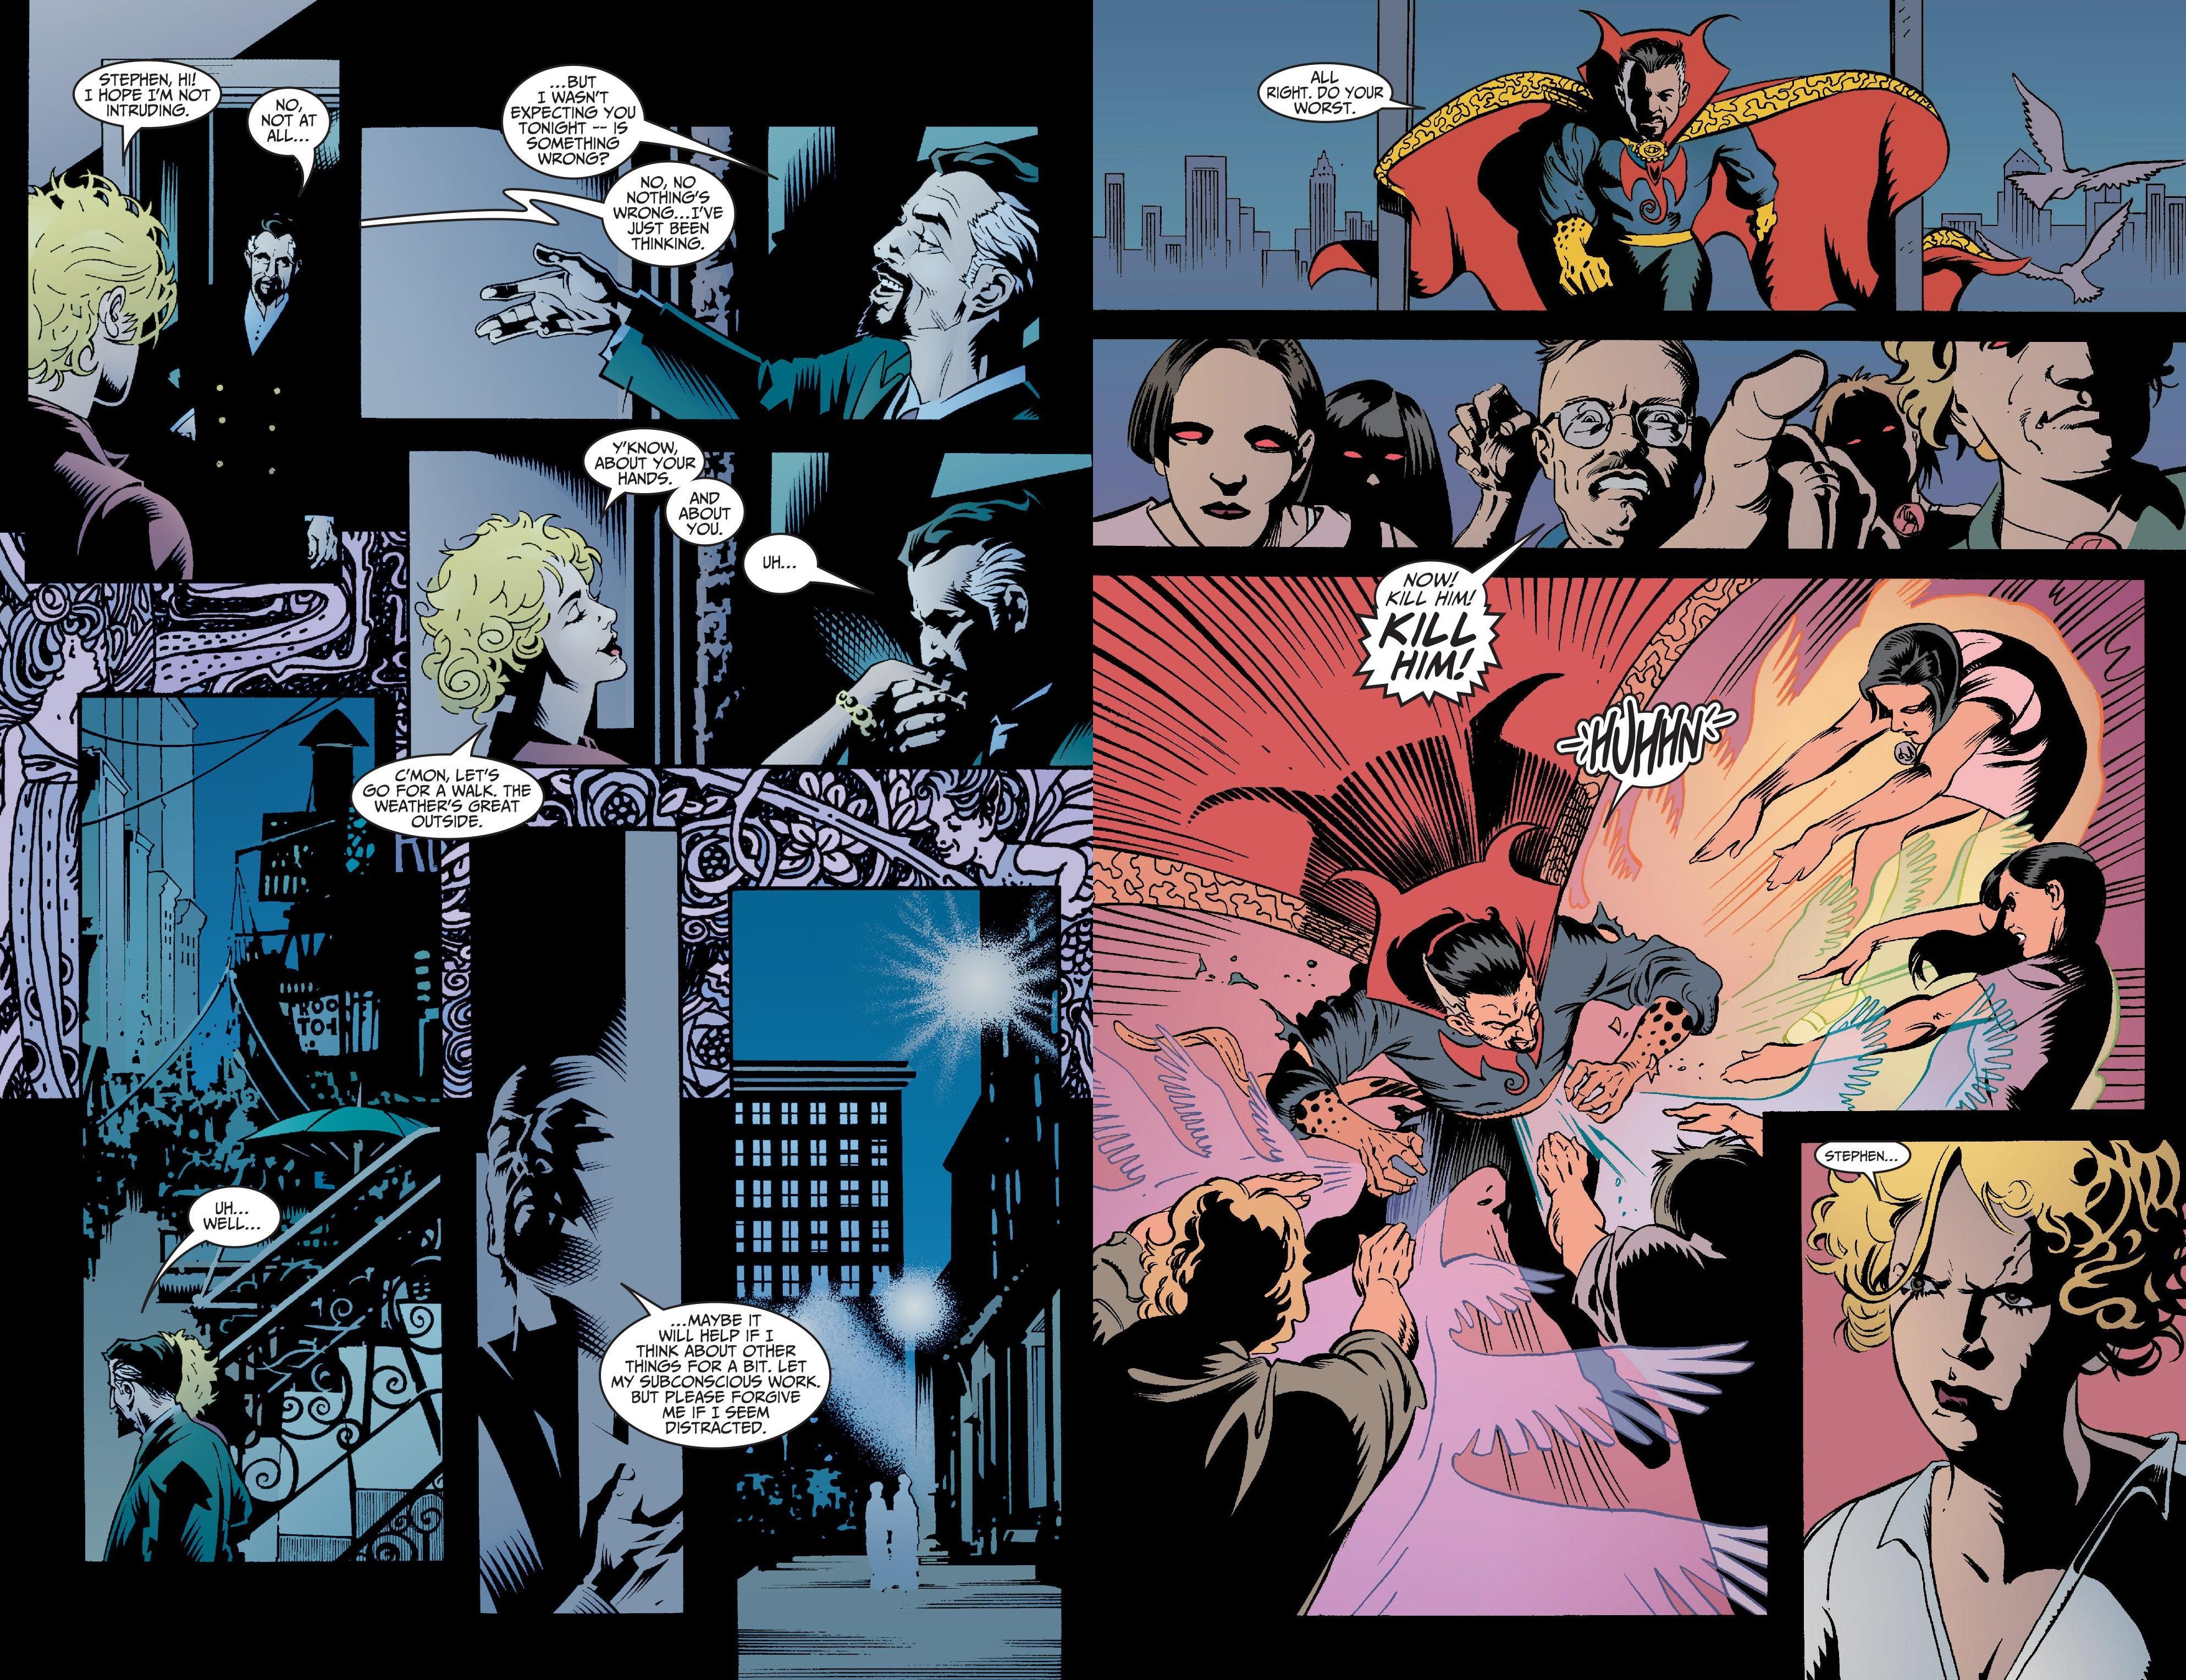 Doctor Strange The Flight of Bones review